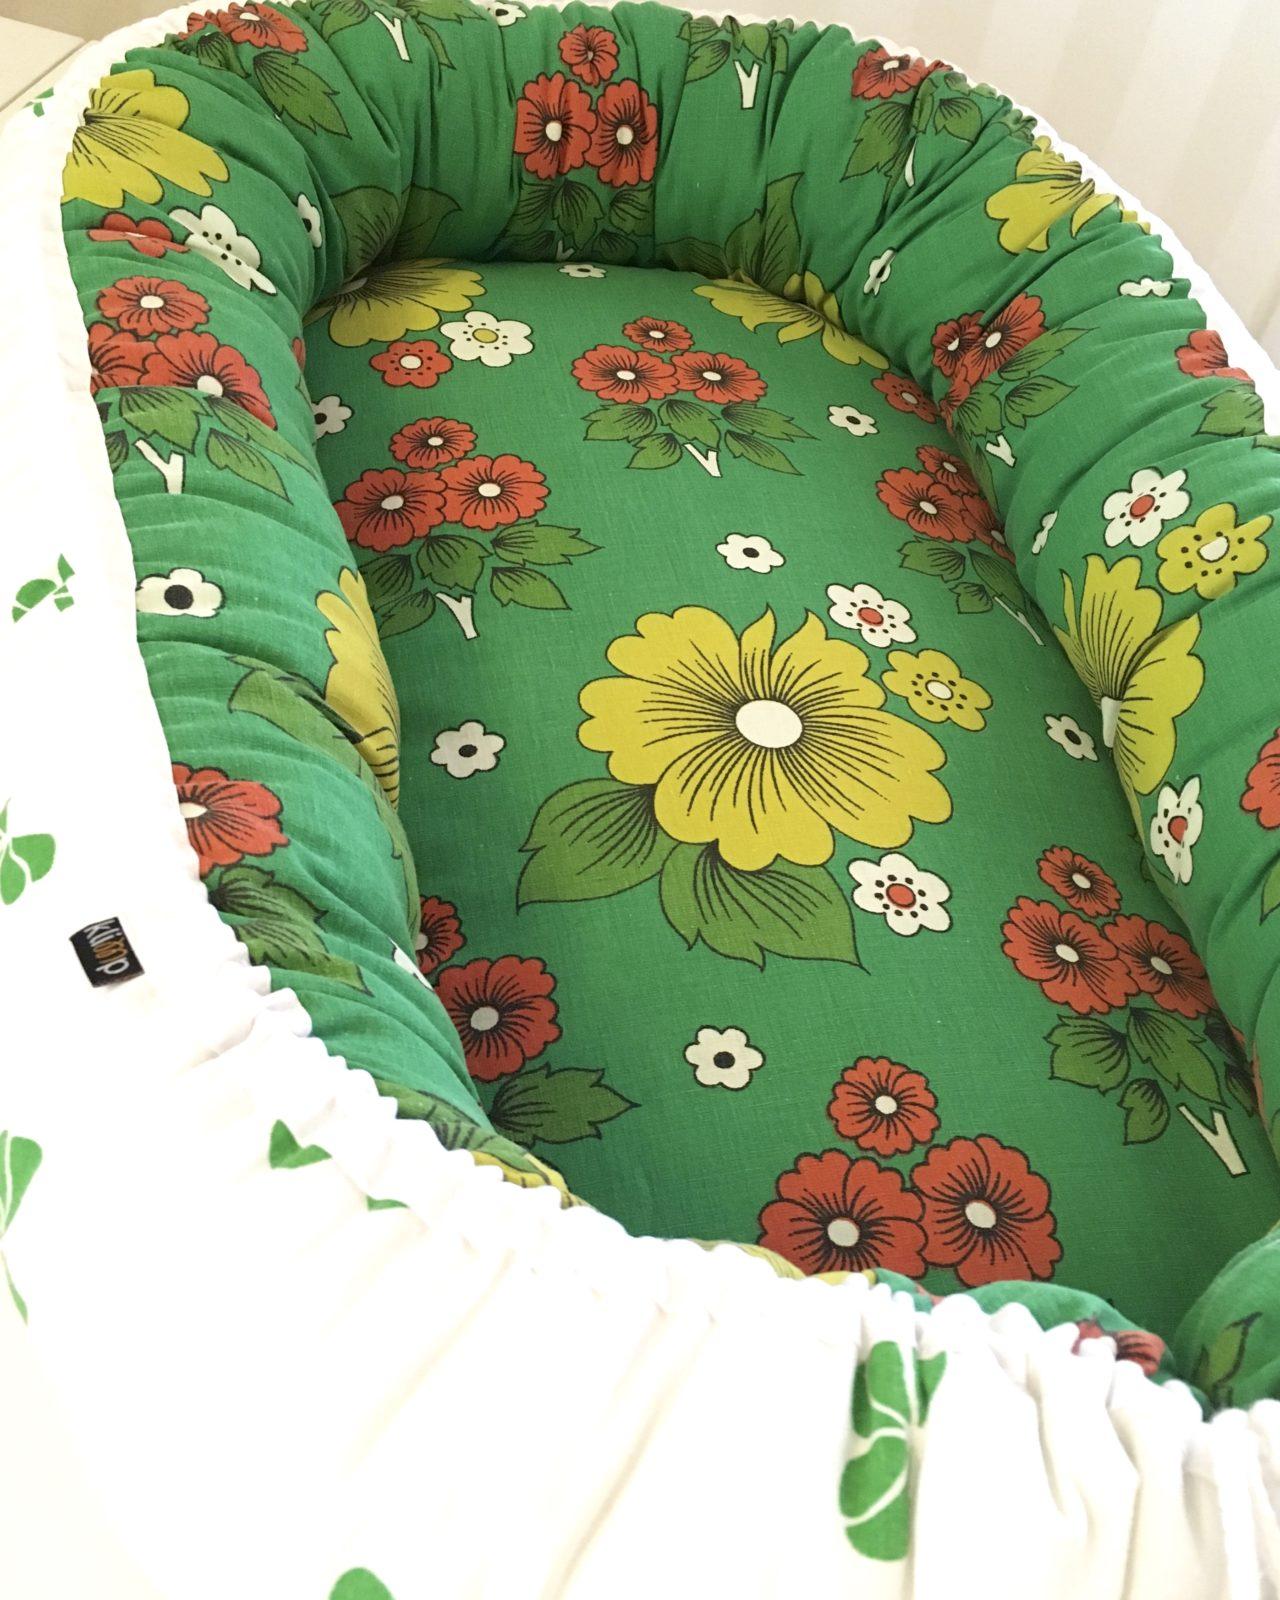 Babynest Retro retrotyg Vintage Vintagetyg Återbruk Eko Miljövänligt Barnbädd Blommigt